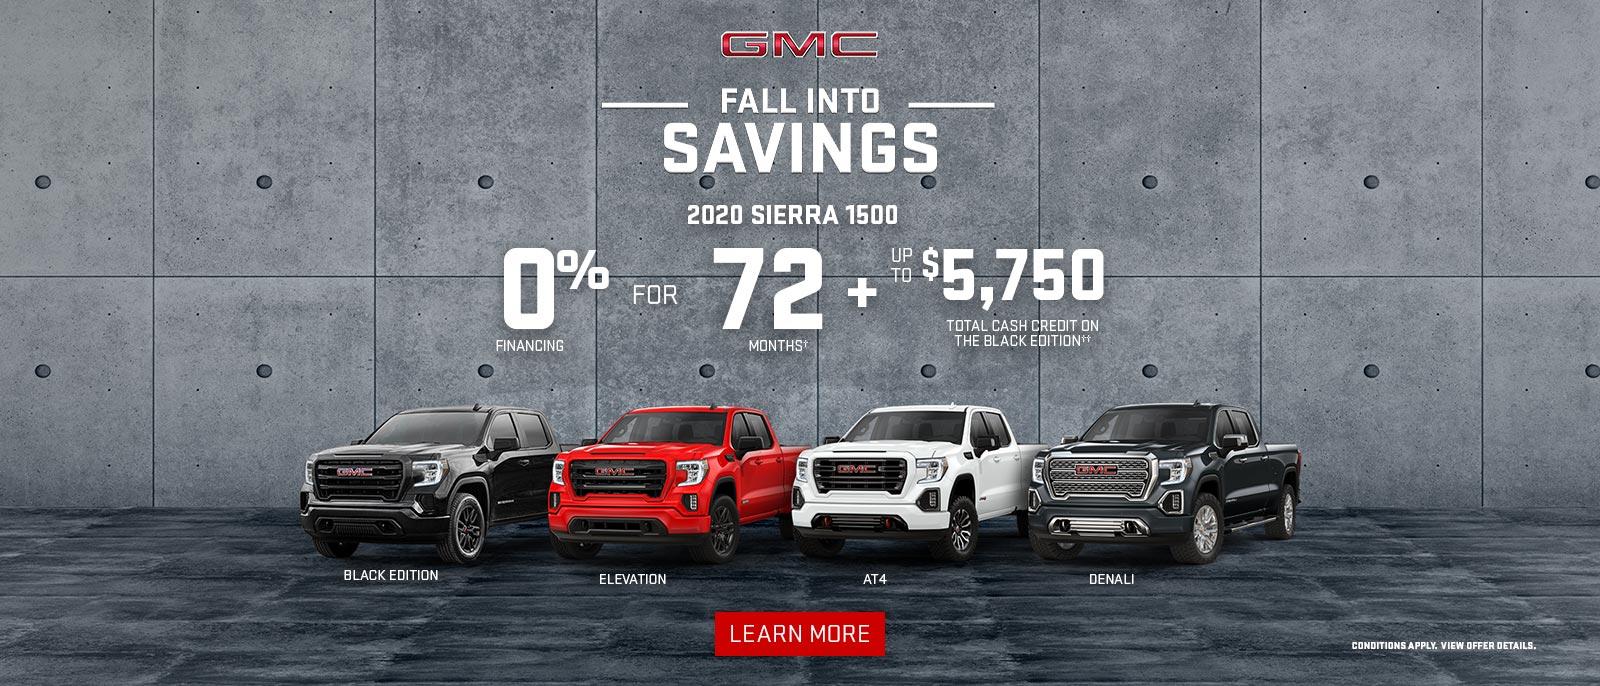 Fall Into Savings on GMC Vehicles